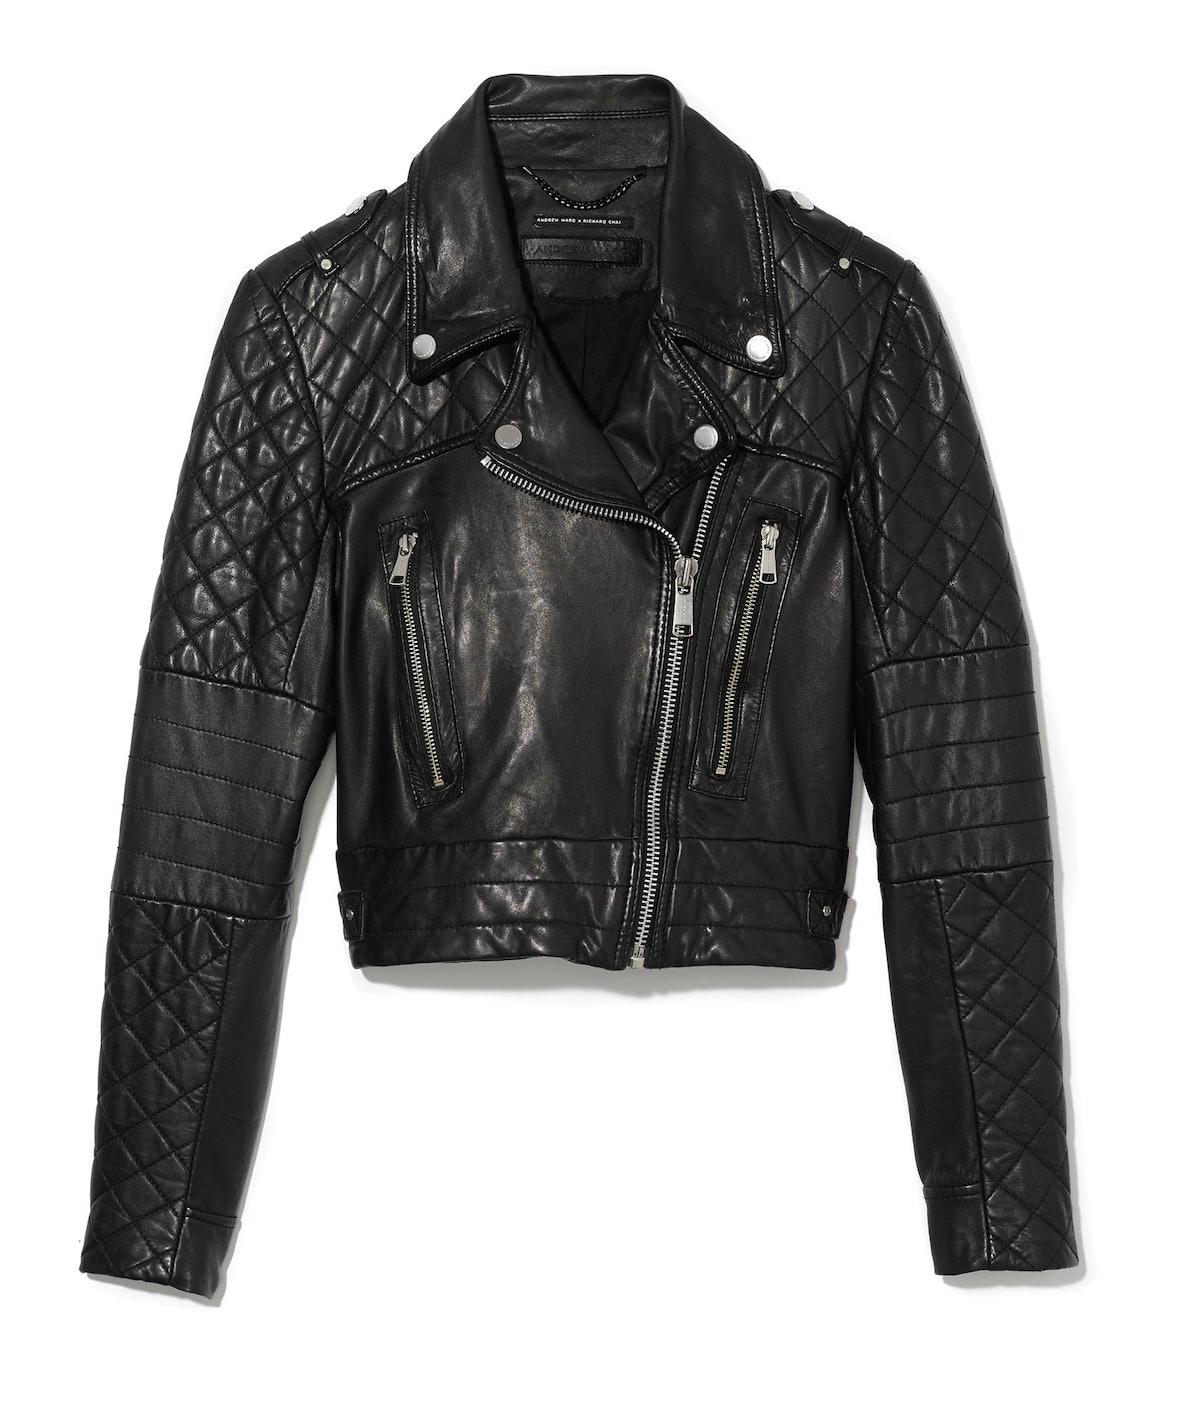 Andrew Marc x Richard Chai jacket